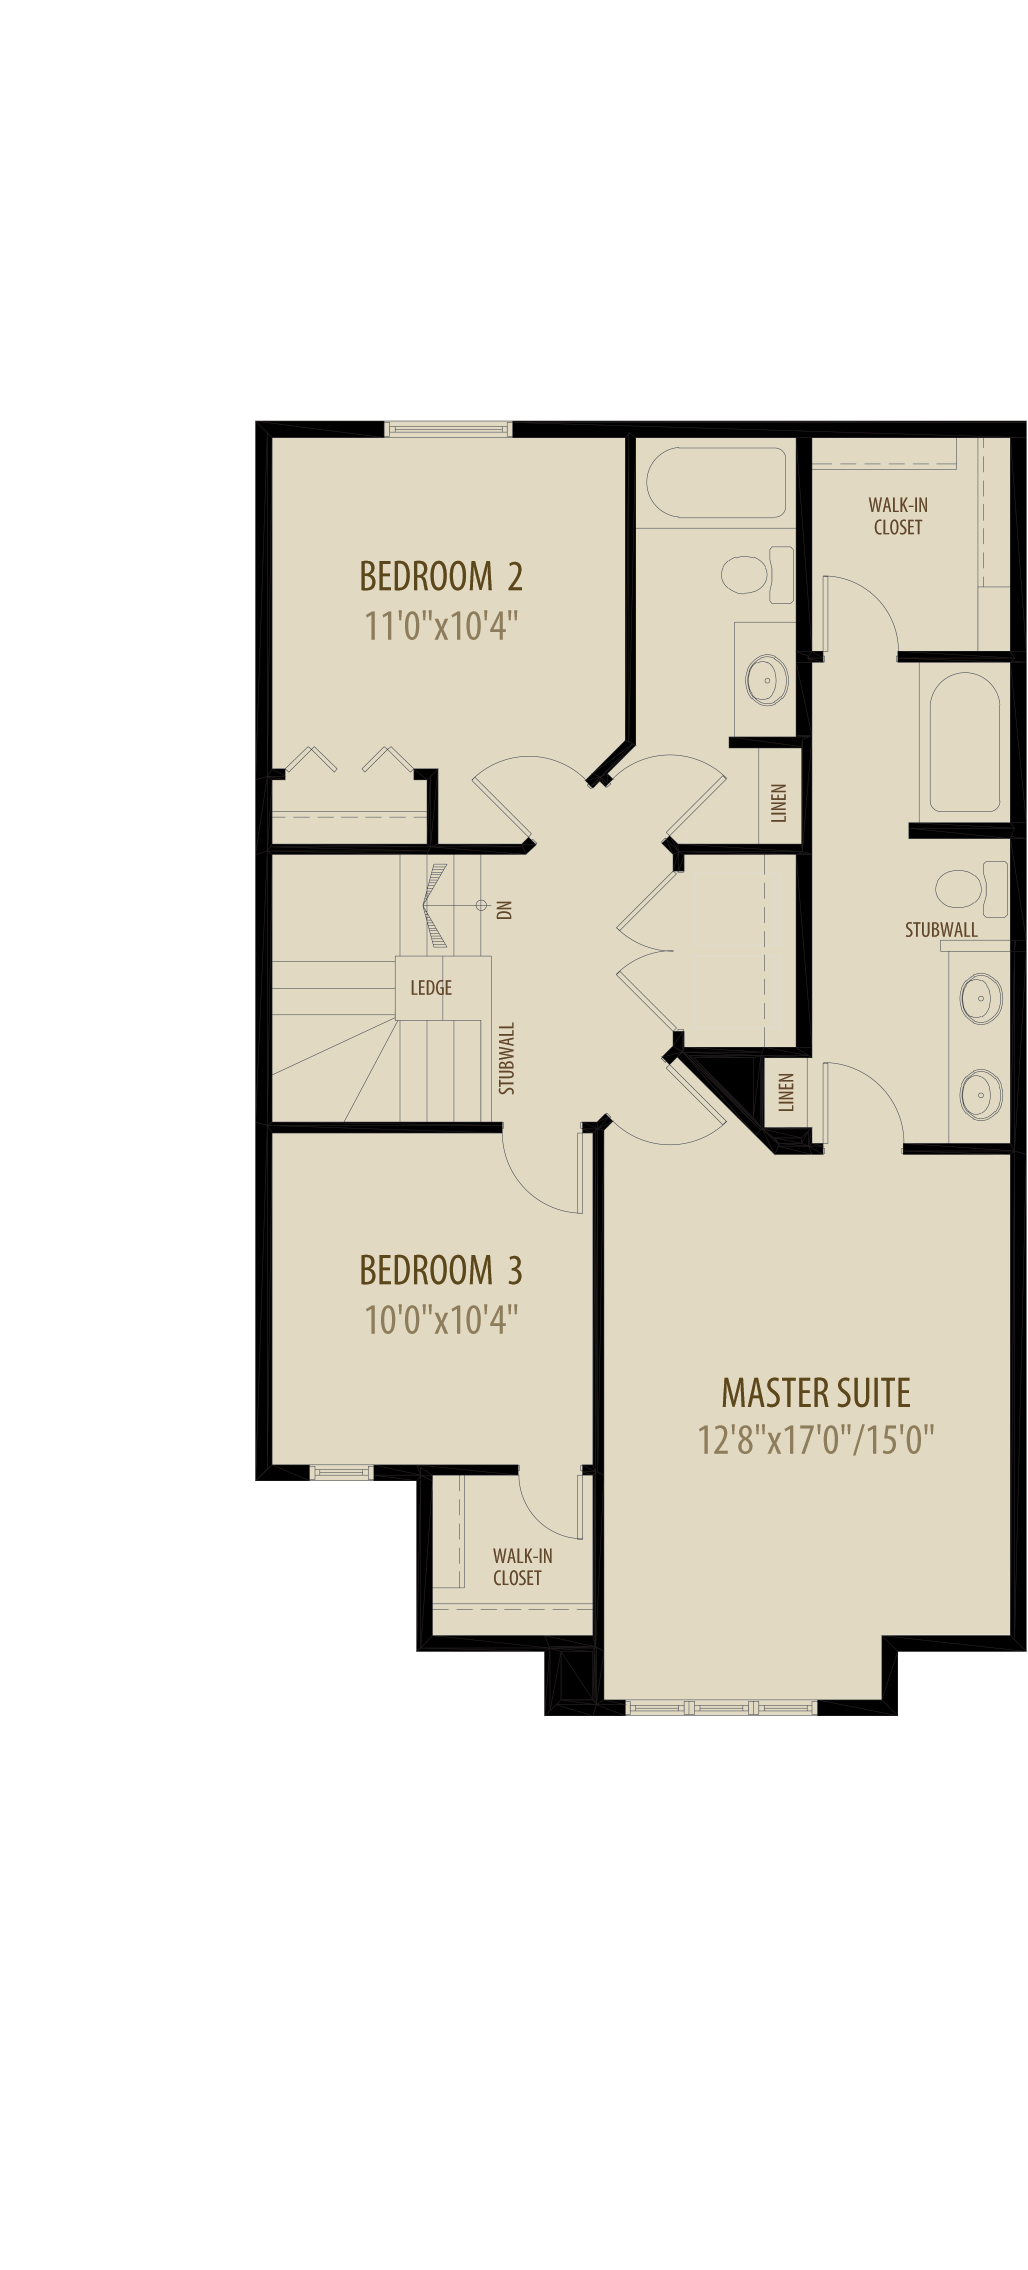 Option 5 Extended Upper Floor adds 57sq ft